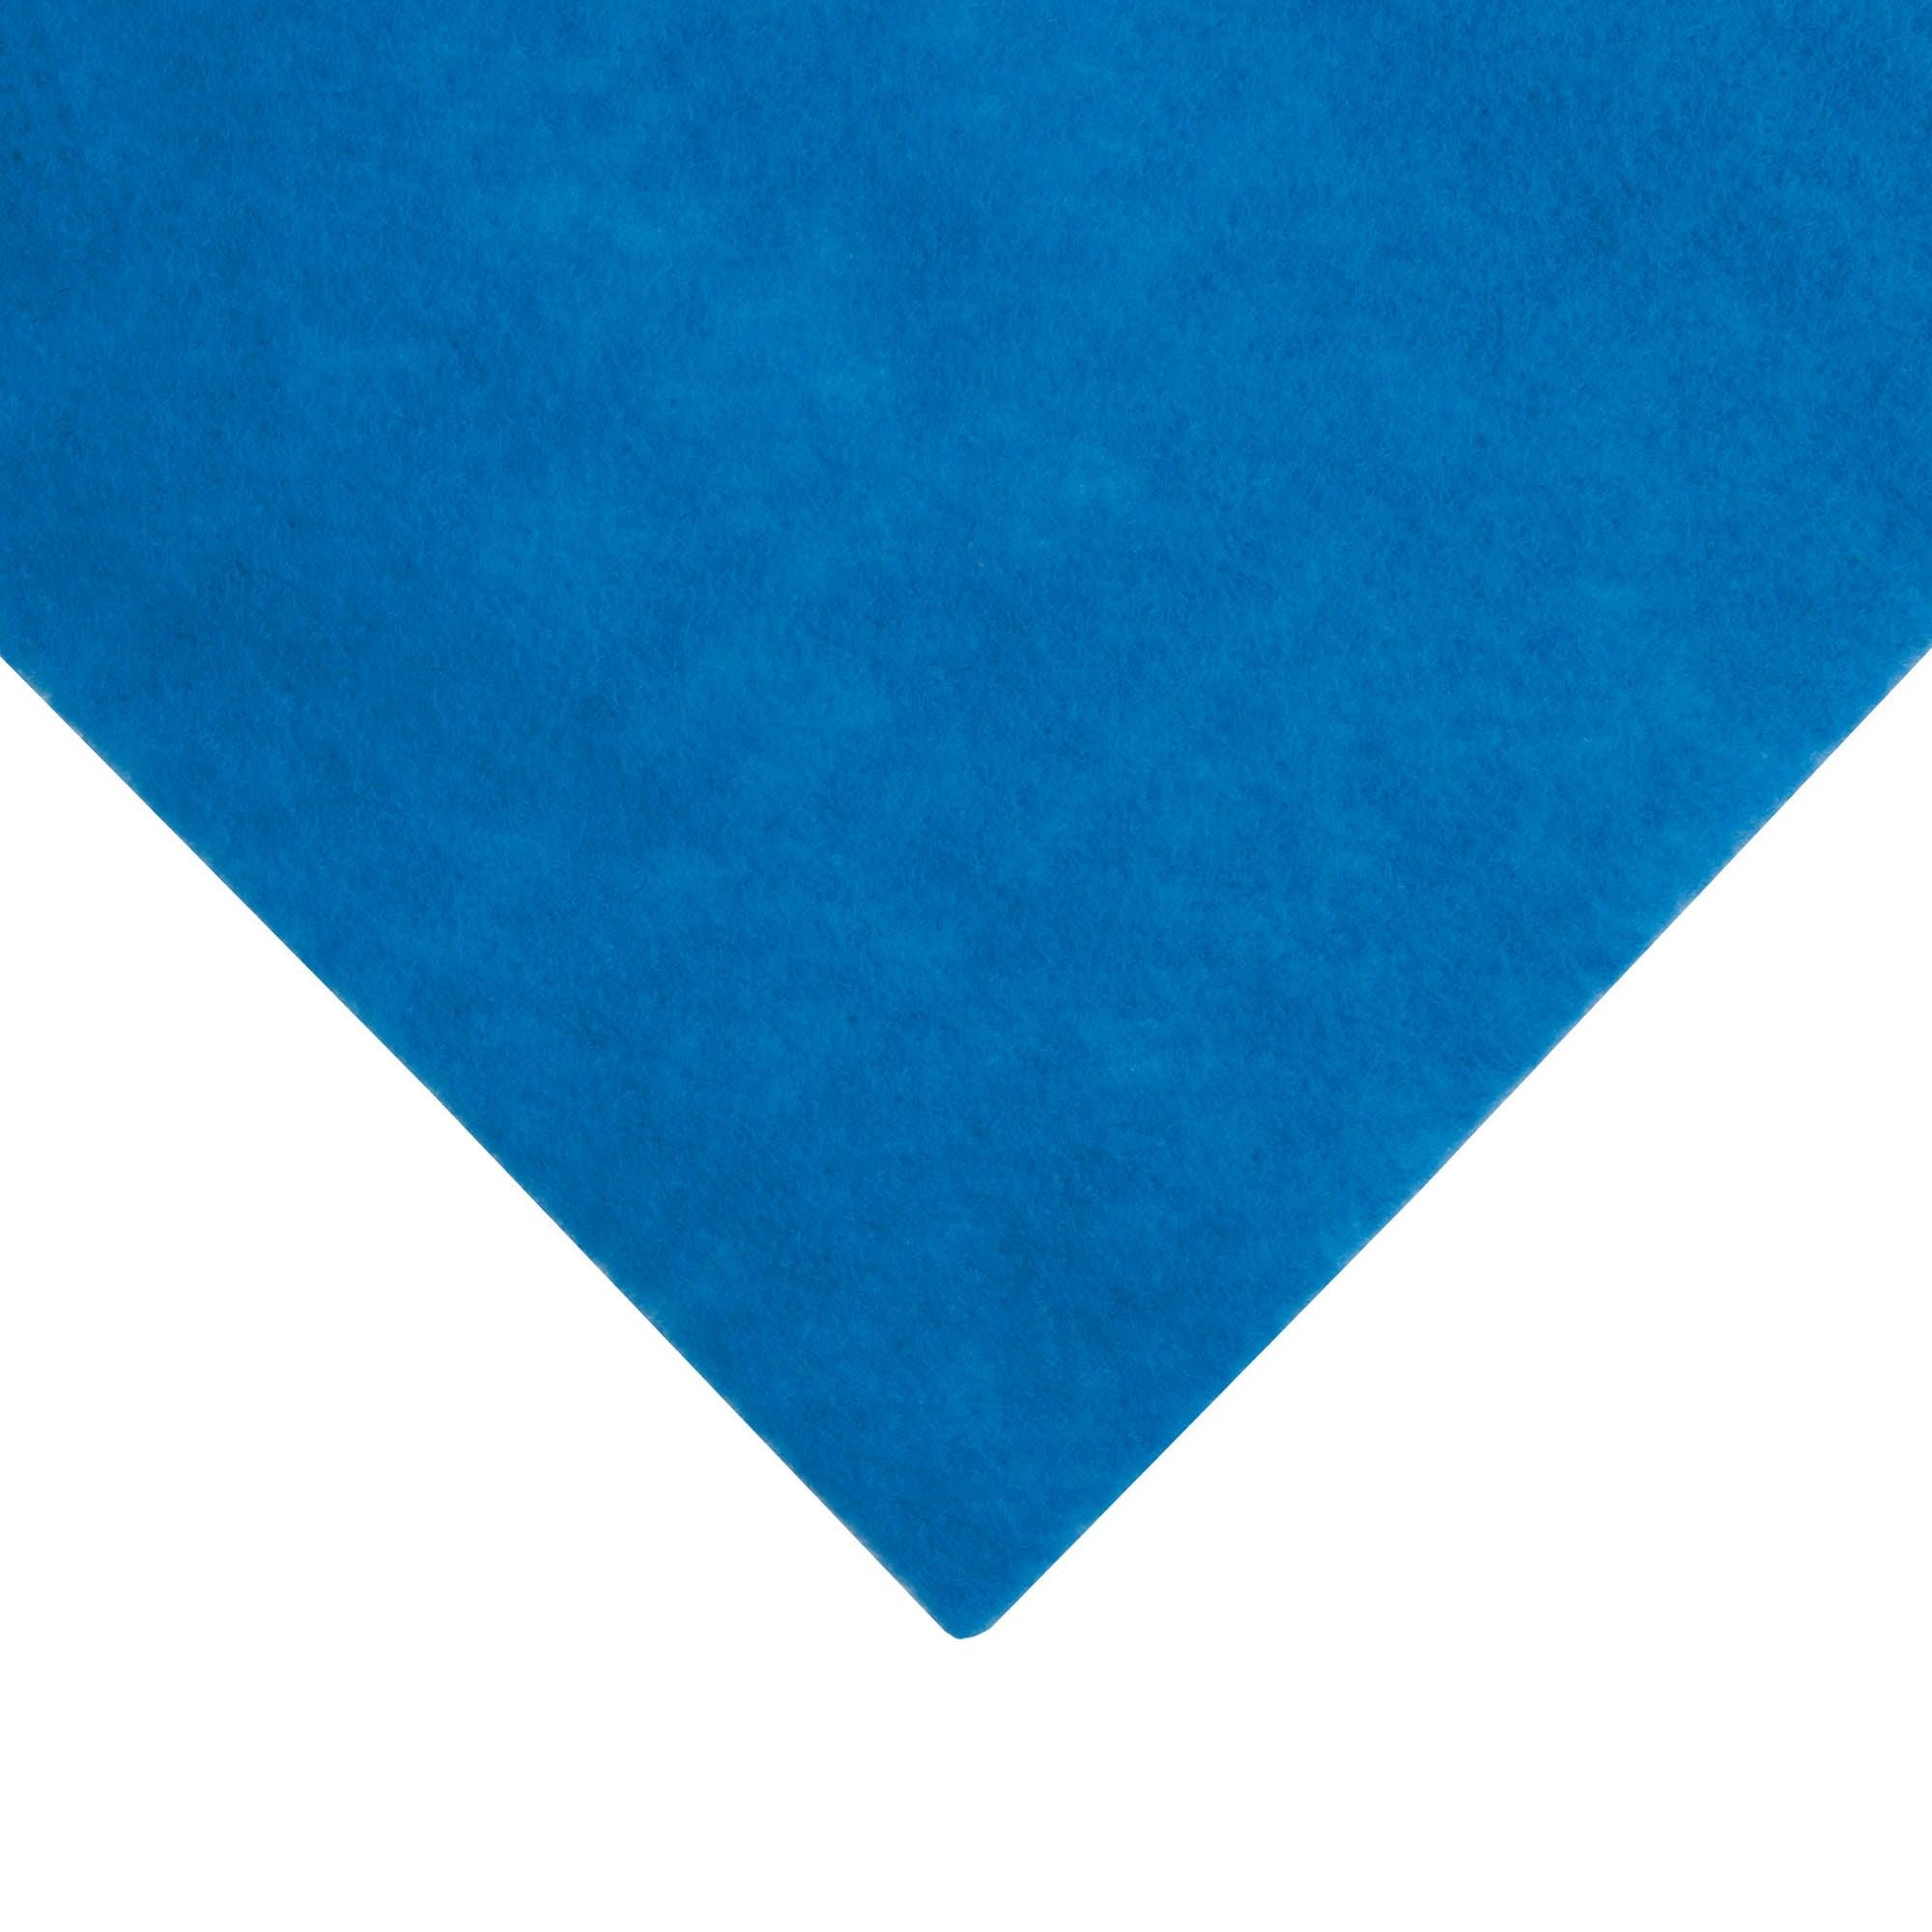 Photo of Minicraft felt roll blue